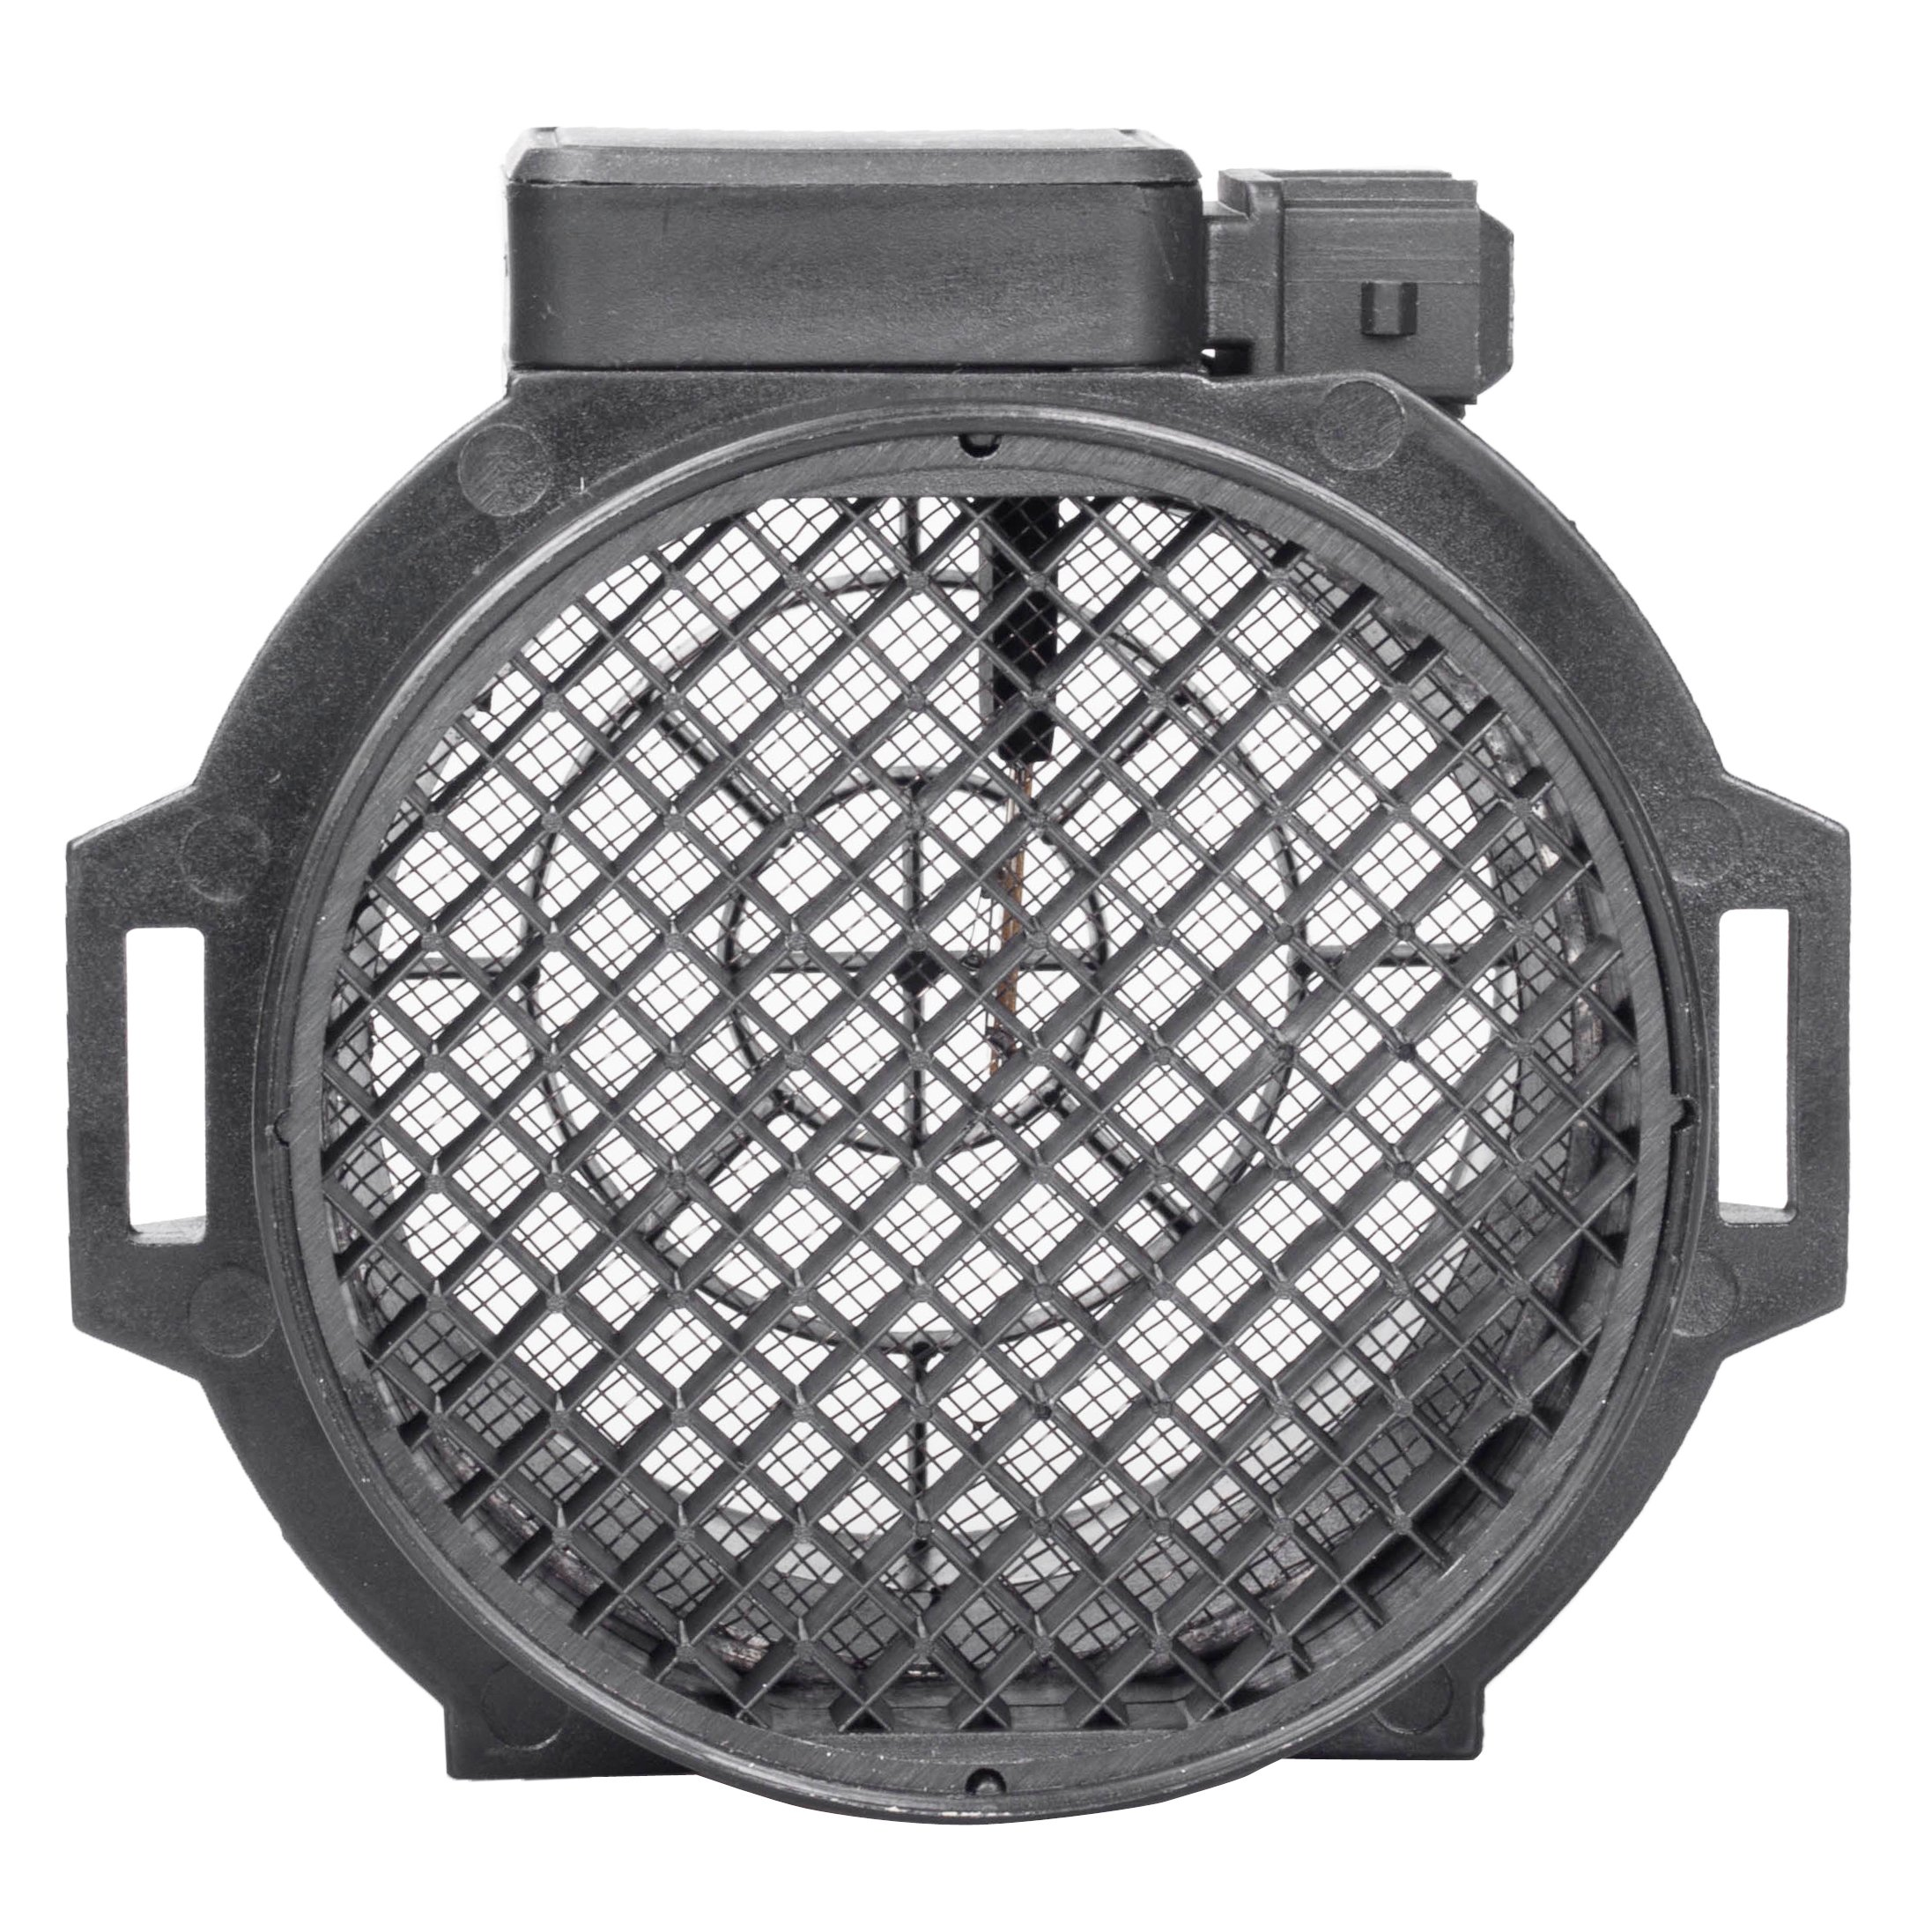 Kwiksen Heated O2 Oxygen Sensor Upstream Right 234-4191 Replacement for Hyundai Sonata V6-2.7L 3921037530 2002 2003 2004 2005